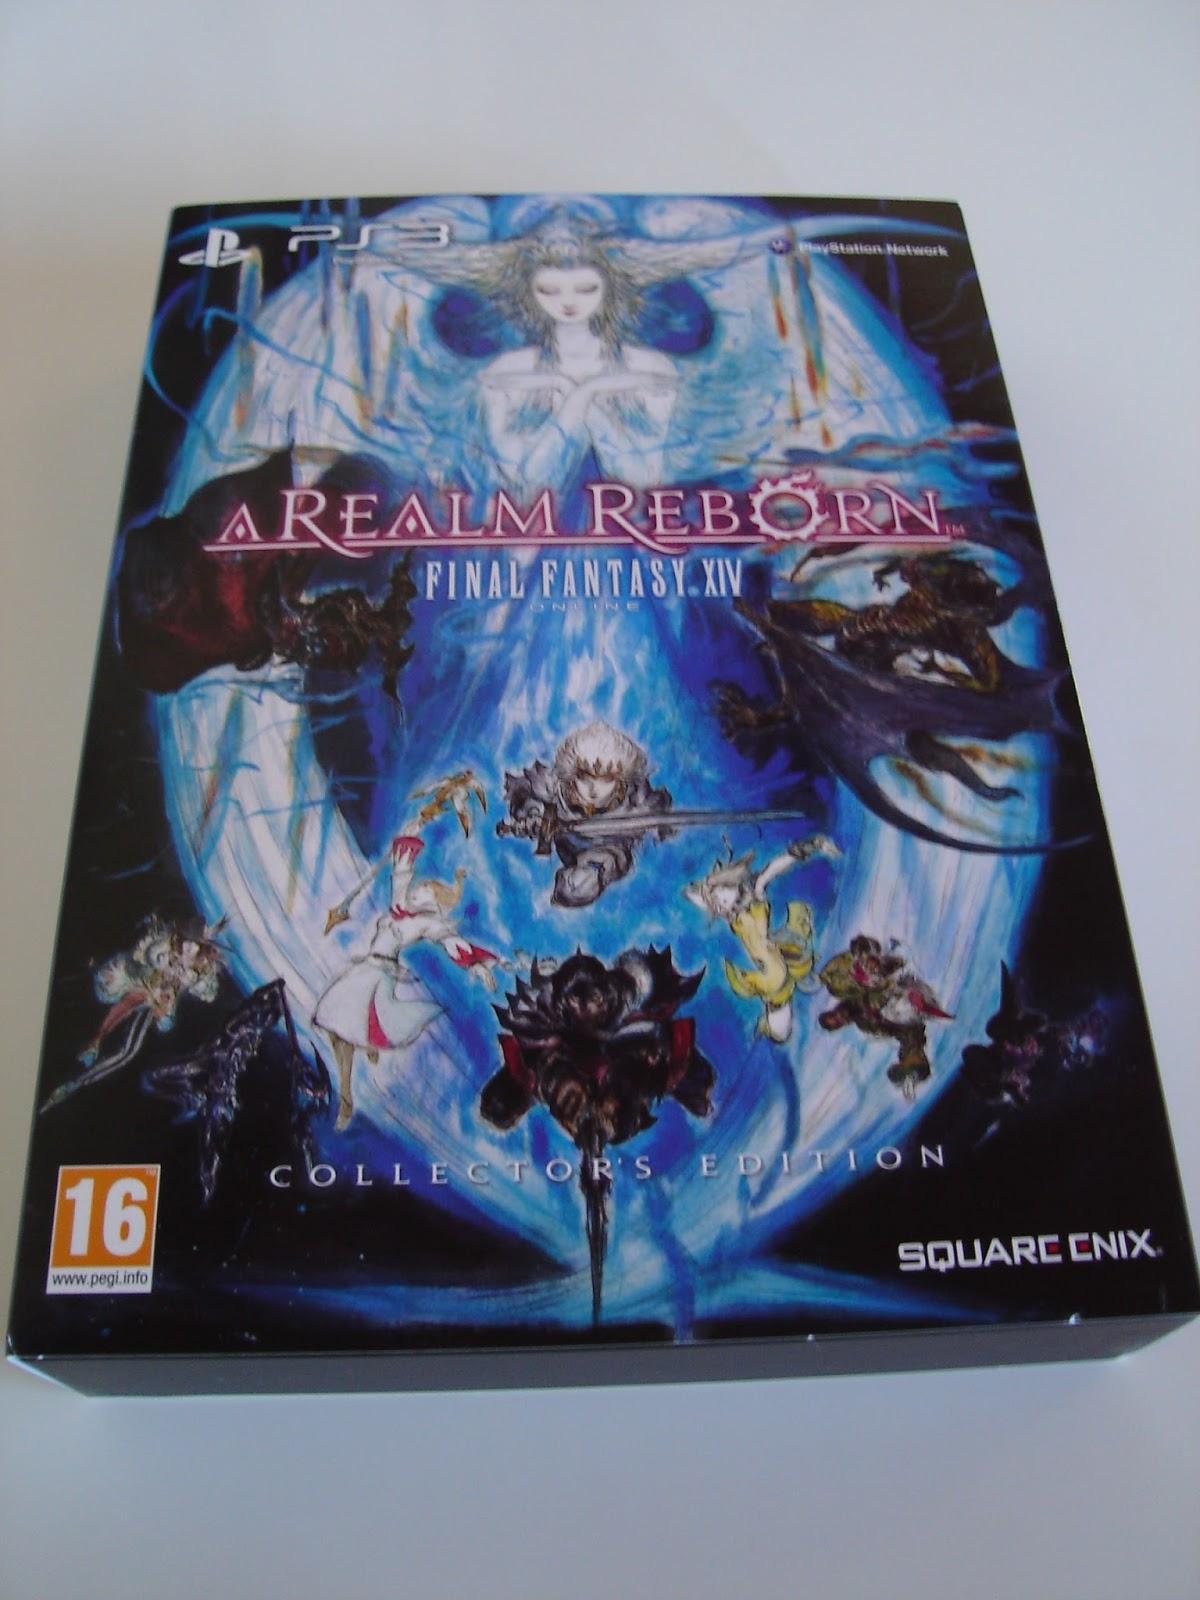 A Realm Reborn: Final Fantasy XIV Collector's Edition PAL